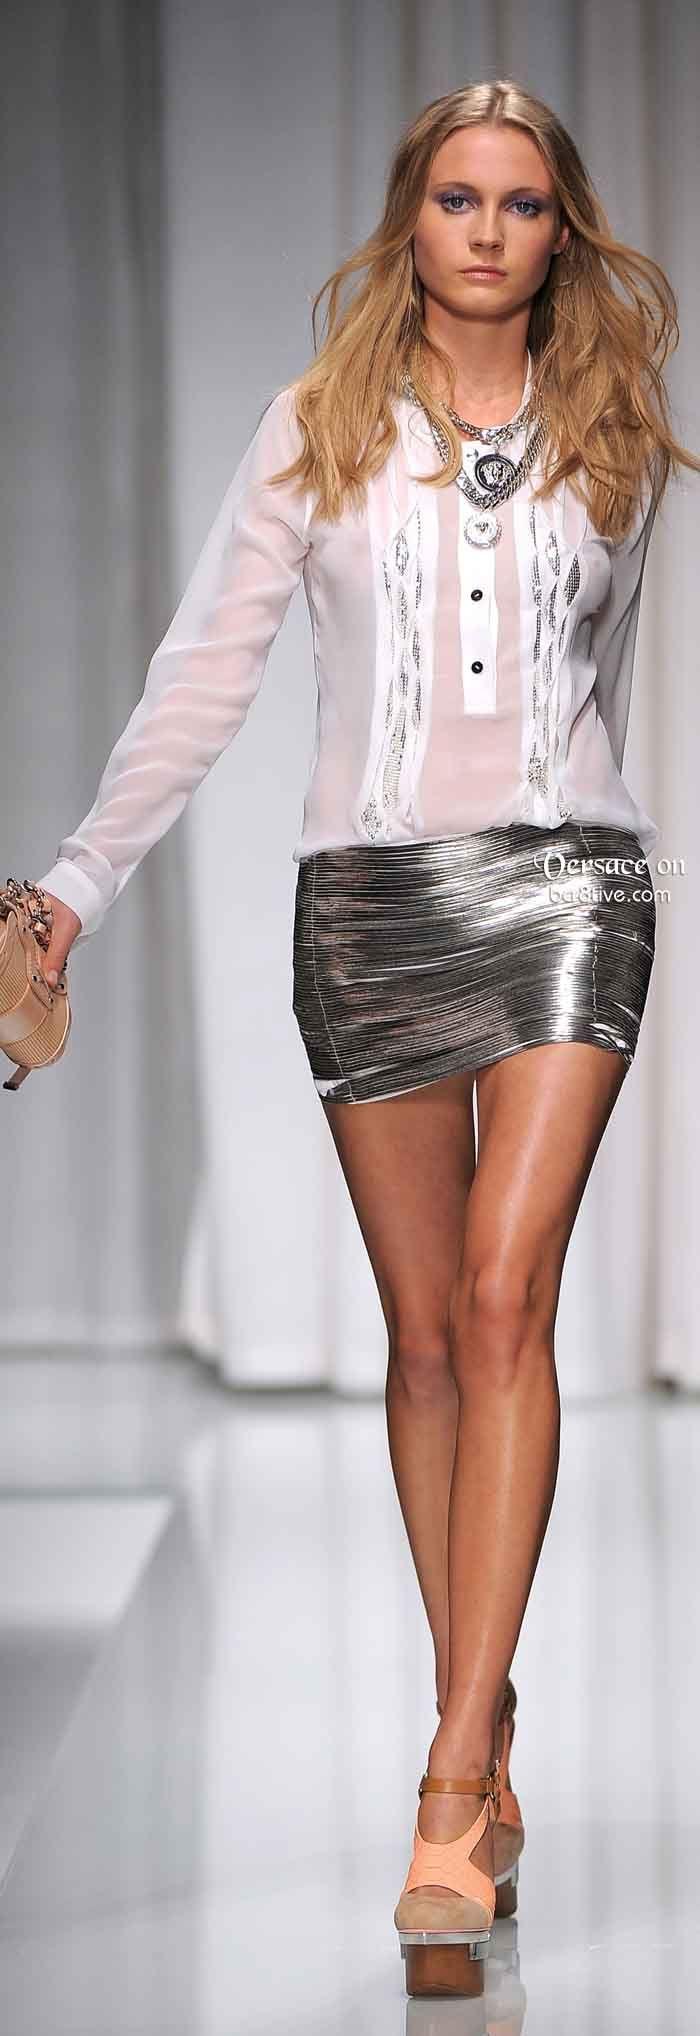 Atelier Versace FallWinter 2014-2015 Collection